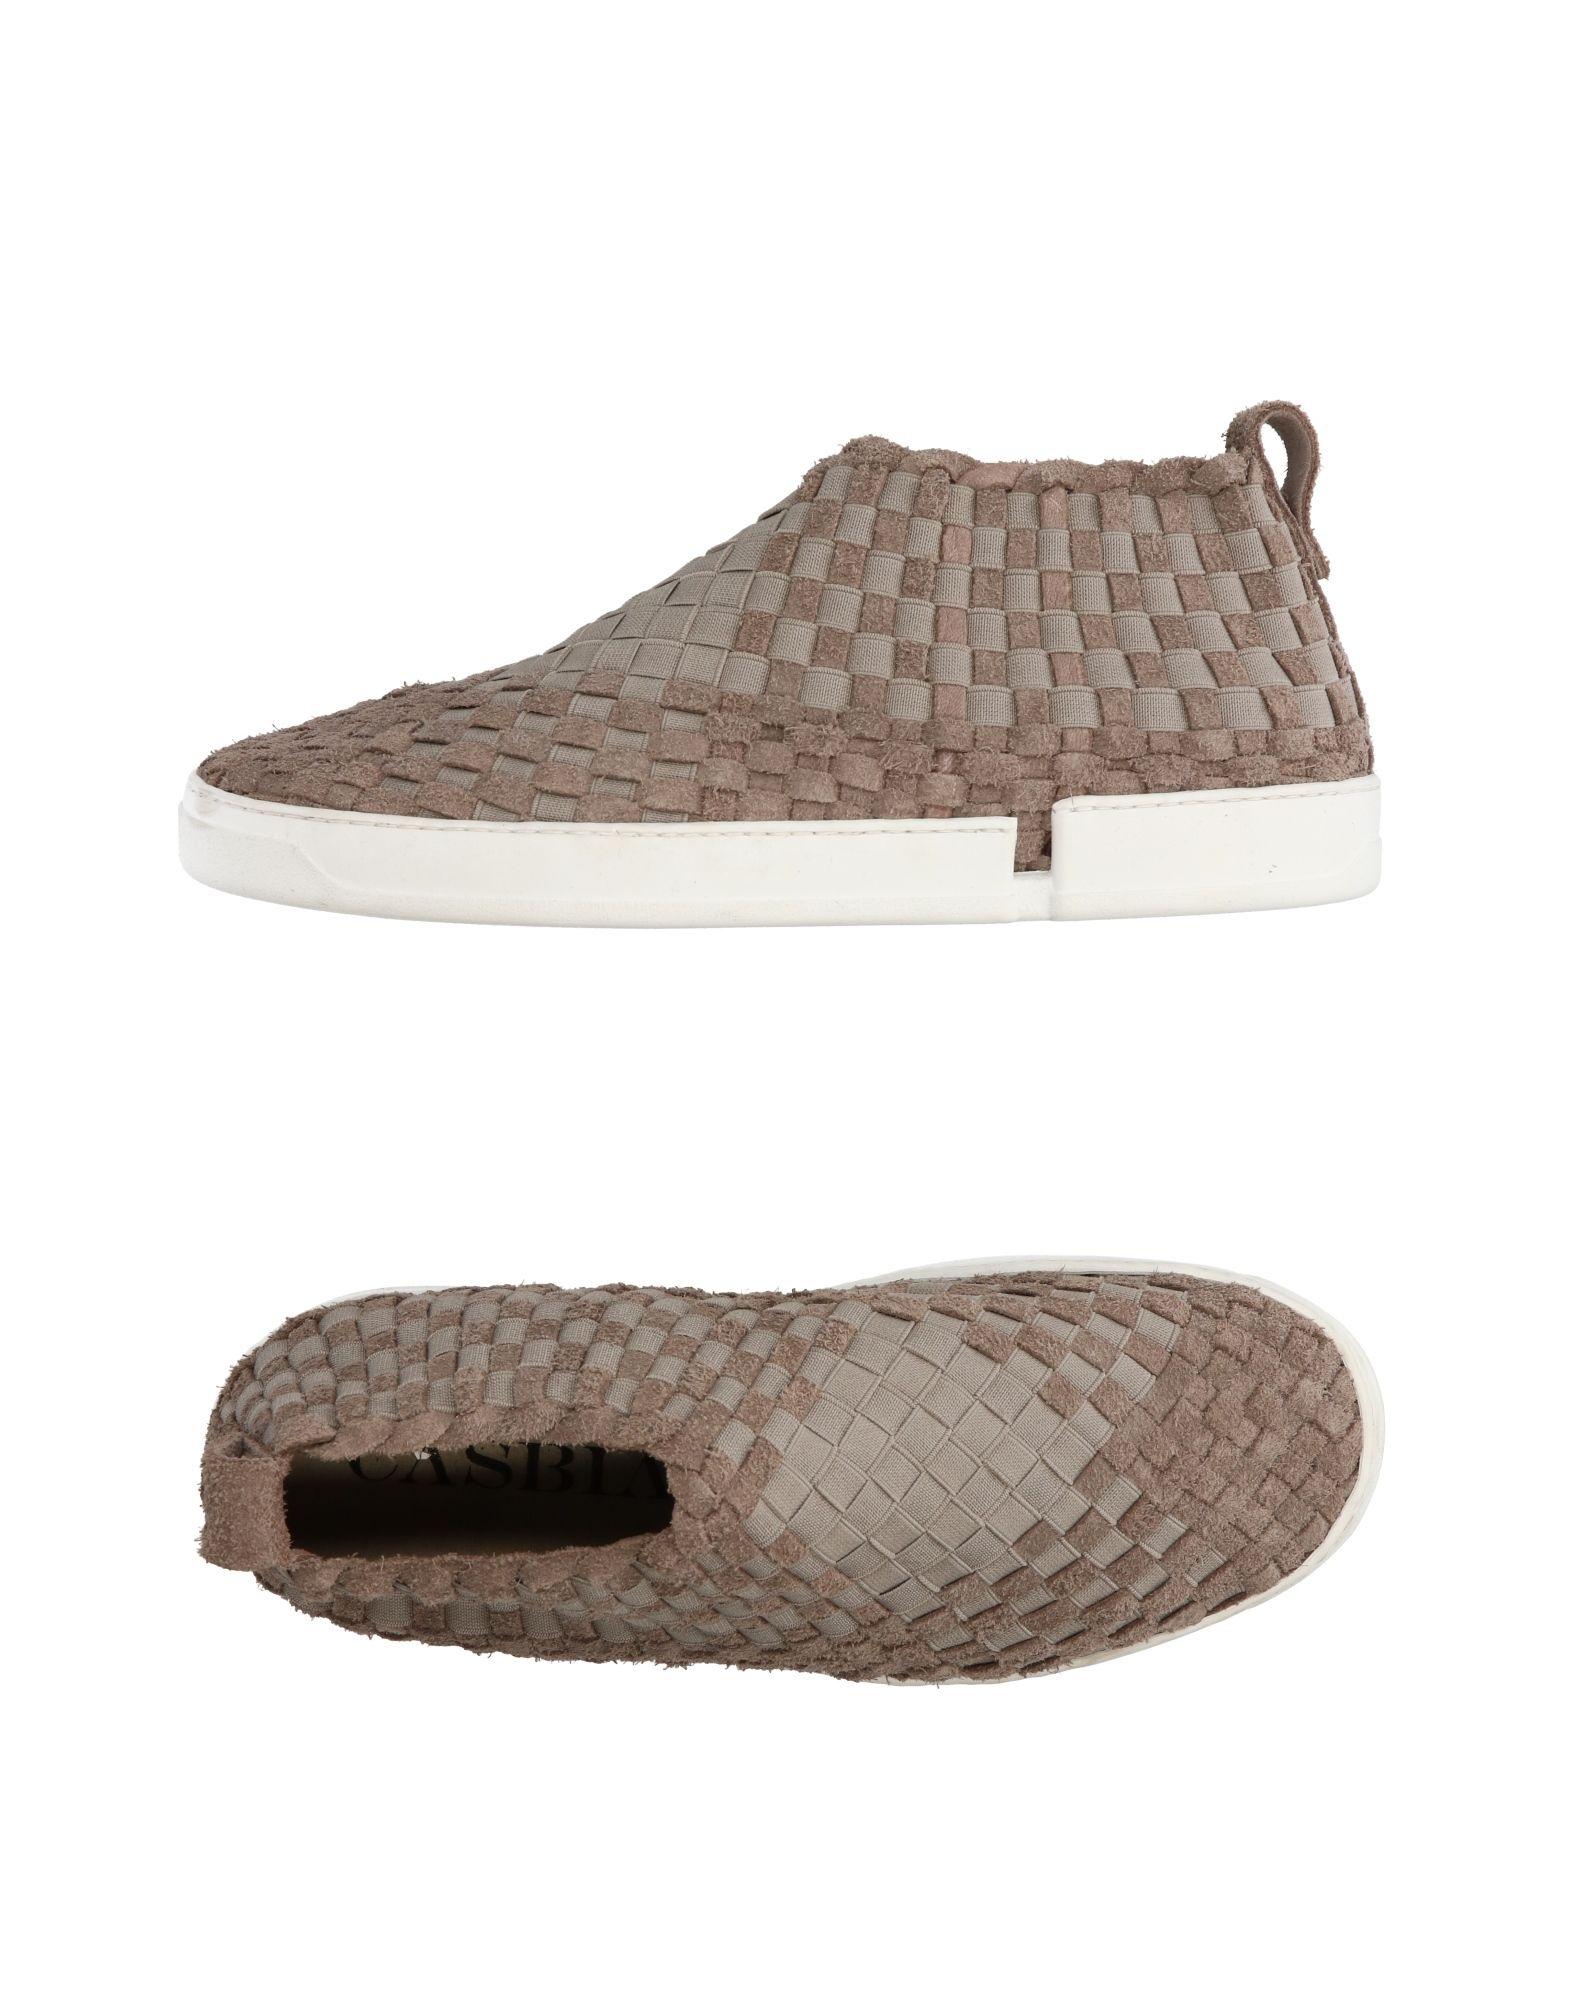 Rabatt echte Schuhe 11261260MN Casbia Sneakers Herren 11261260MN Schuhe  739204 52c8ddf0f5